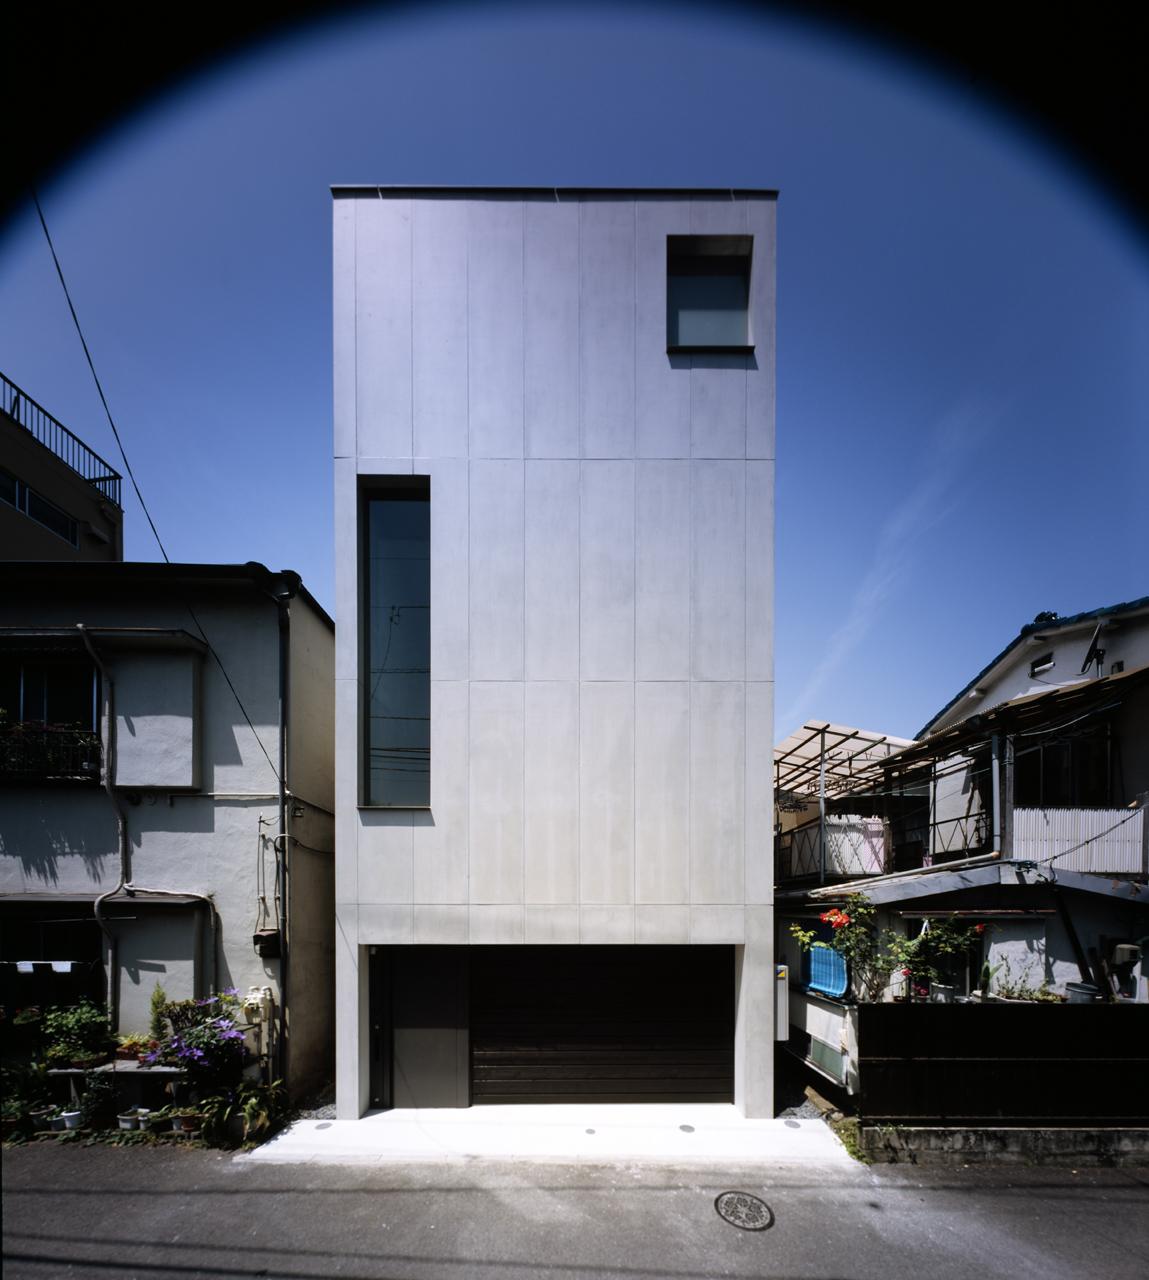 2 Courts House / Keiji Ashizawa Design, © Daici Ano